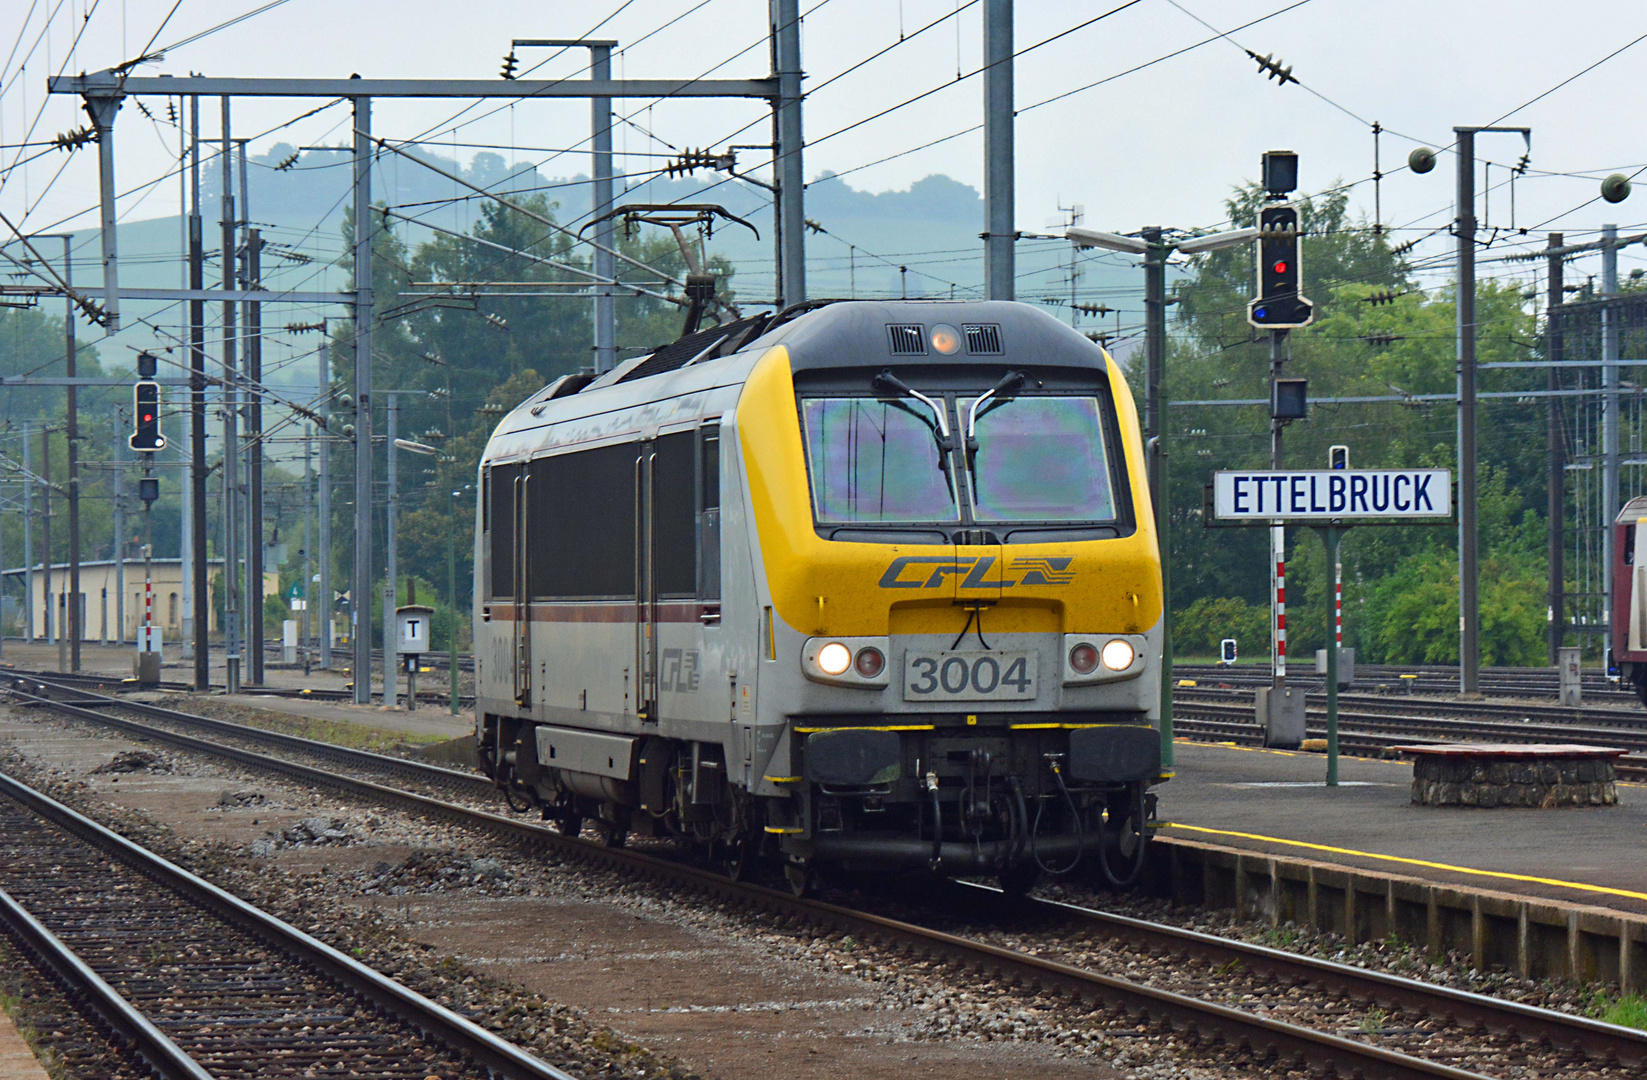 CFL 3004.